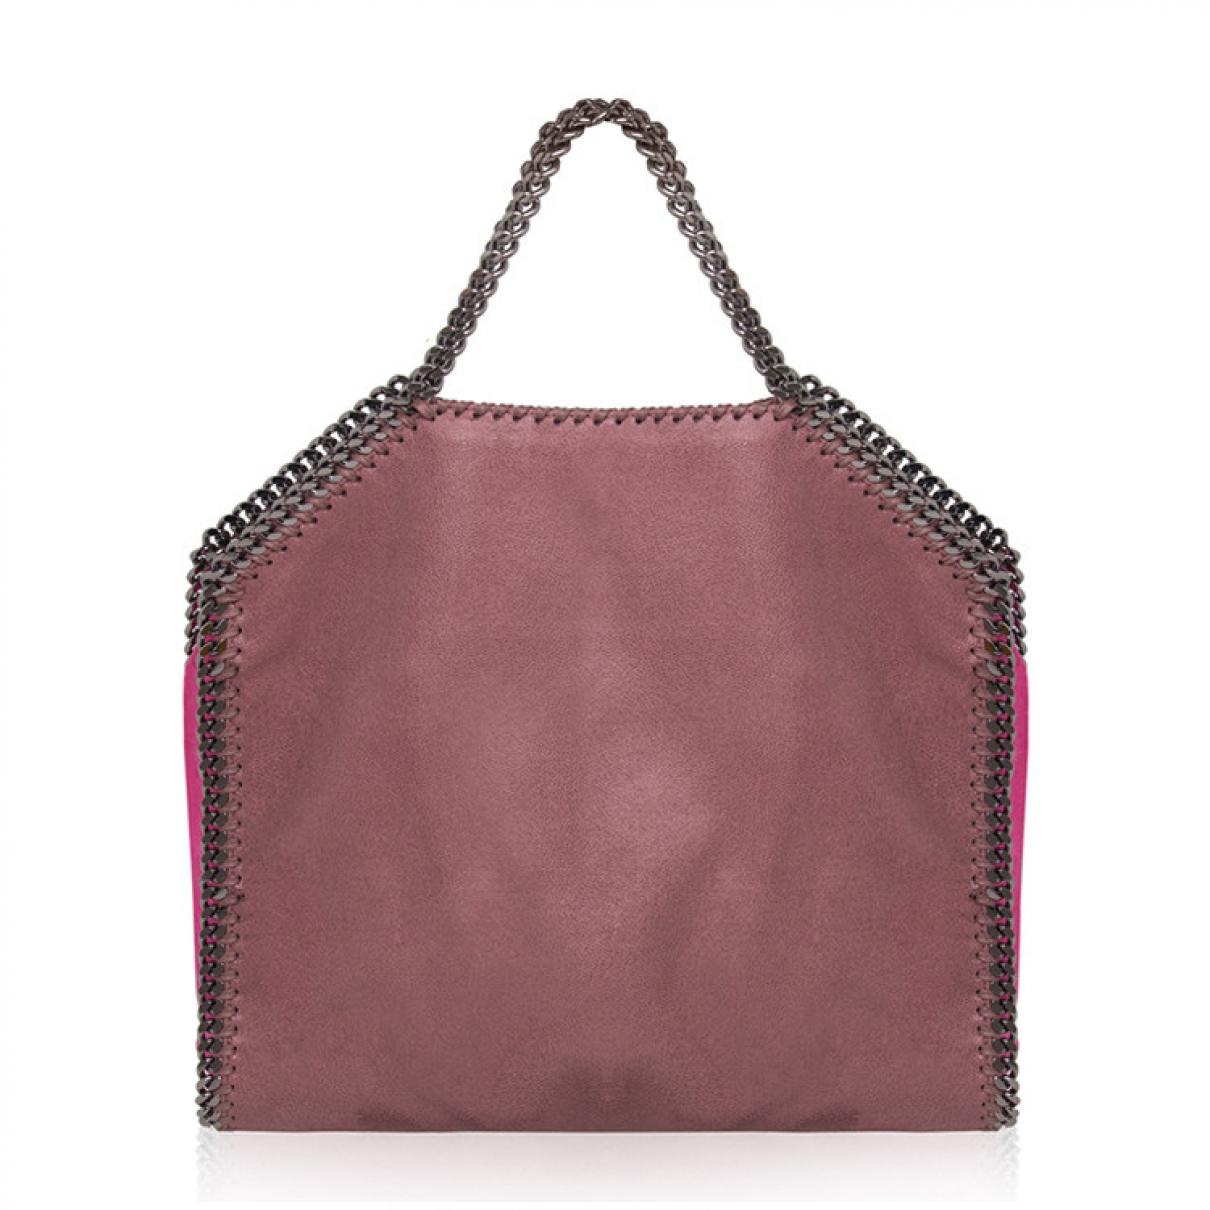 Stella Mccartney Falabella Handtasche in  Rosa Synthetik